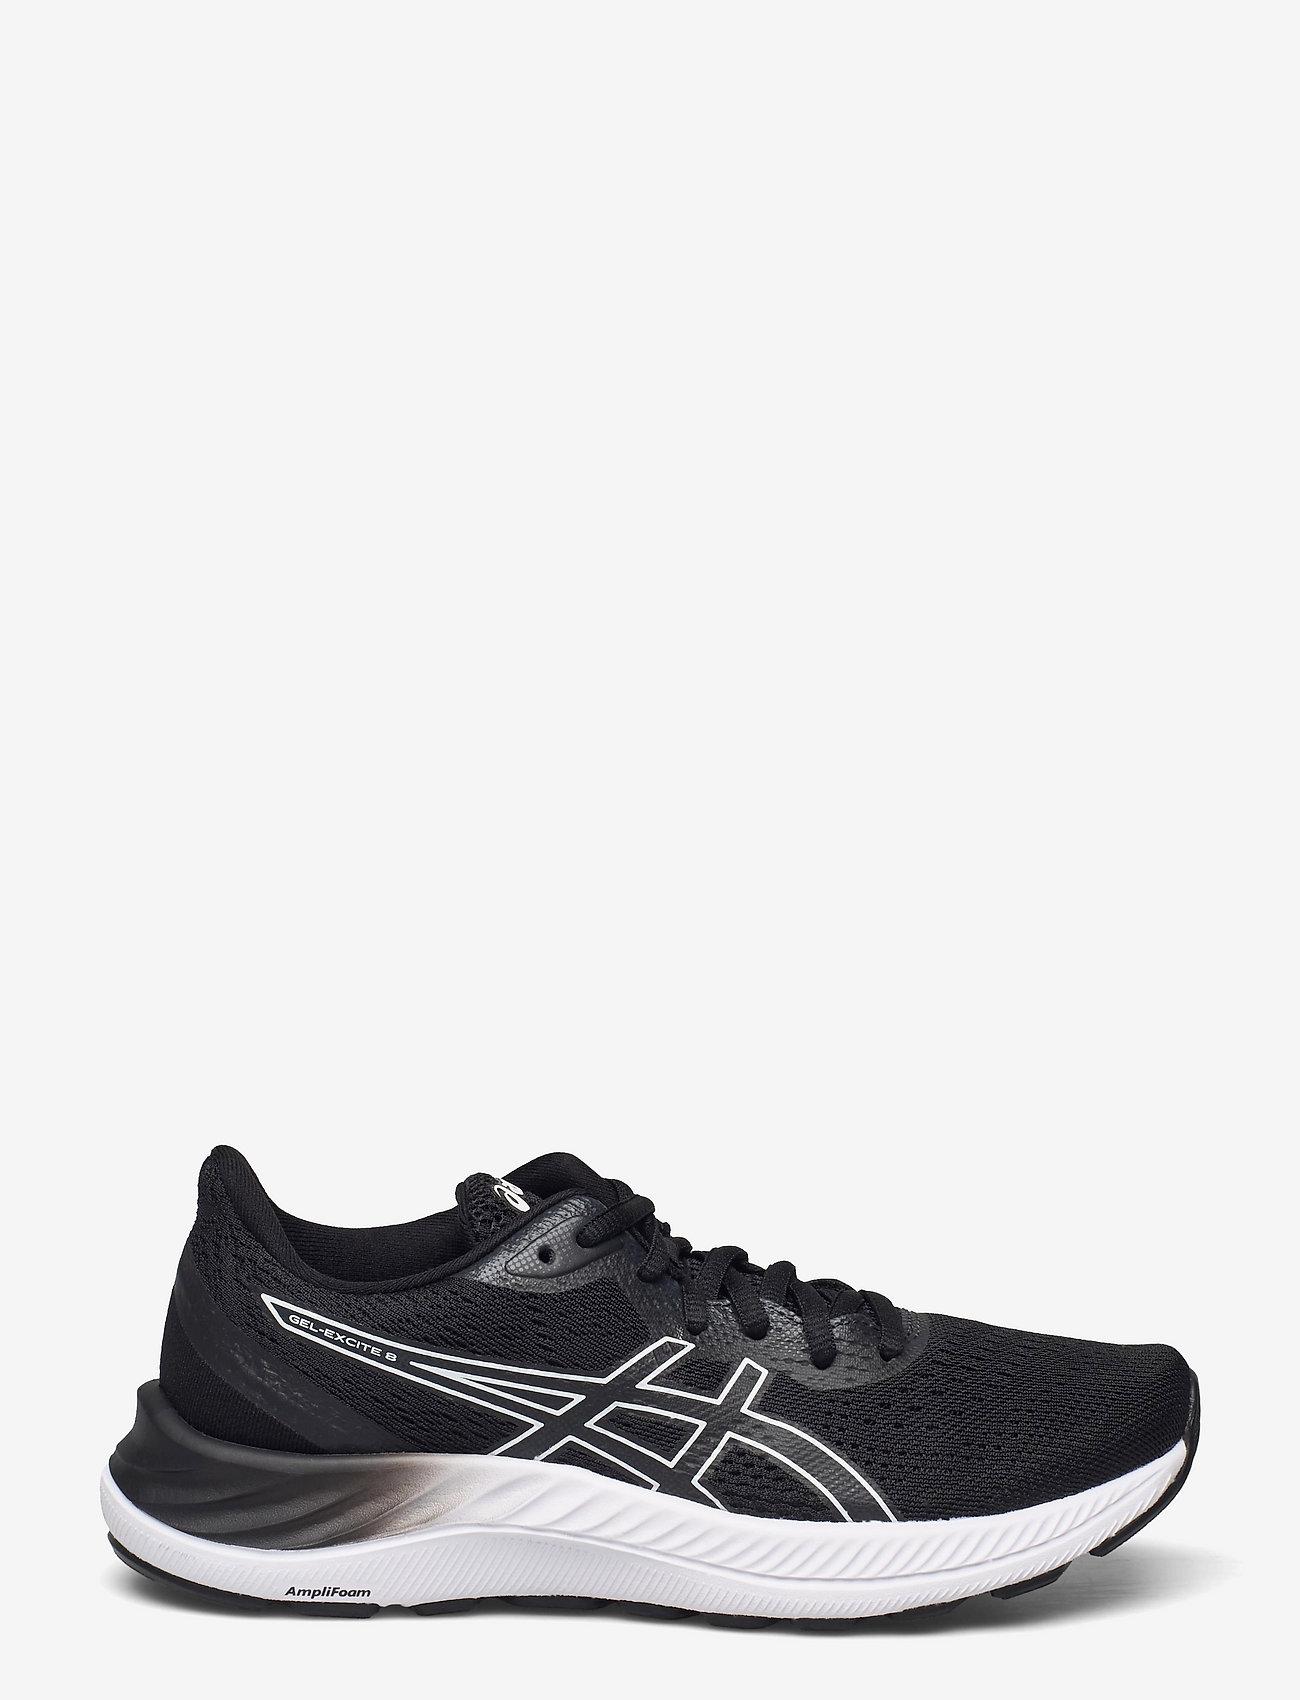 Asics - GEL-EXCITE 8 - running shoes - black/white - 1